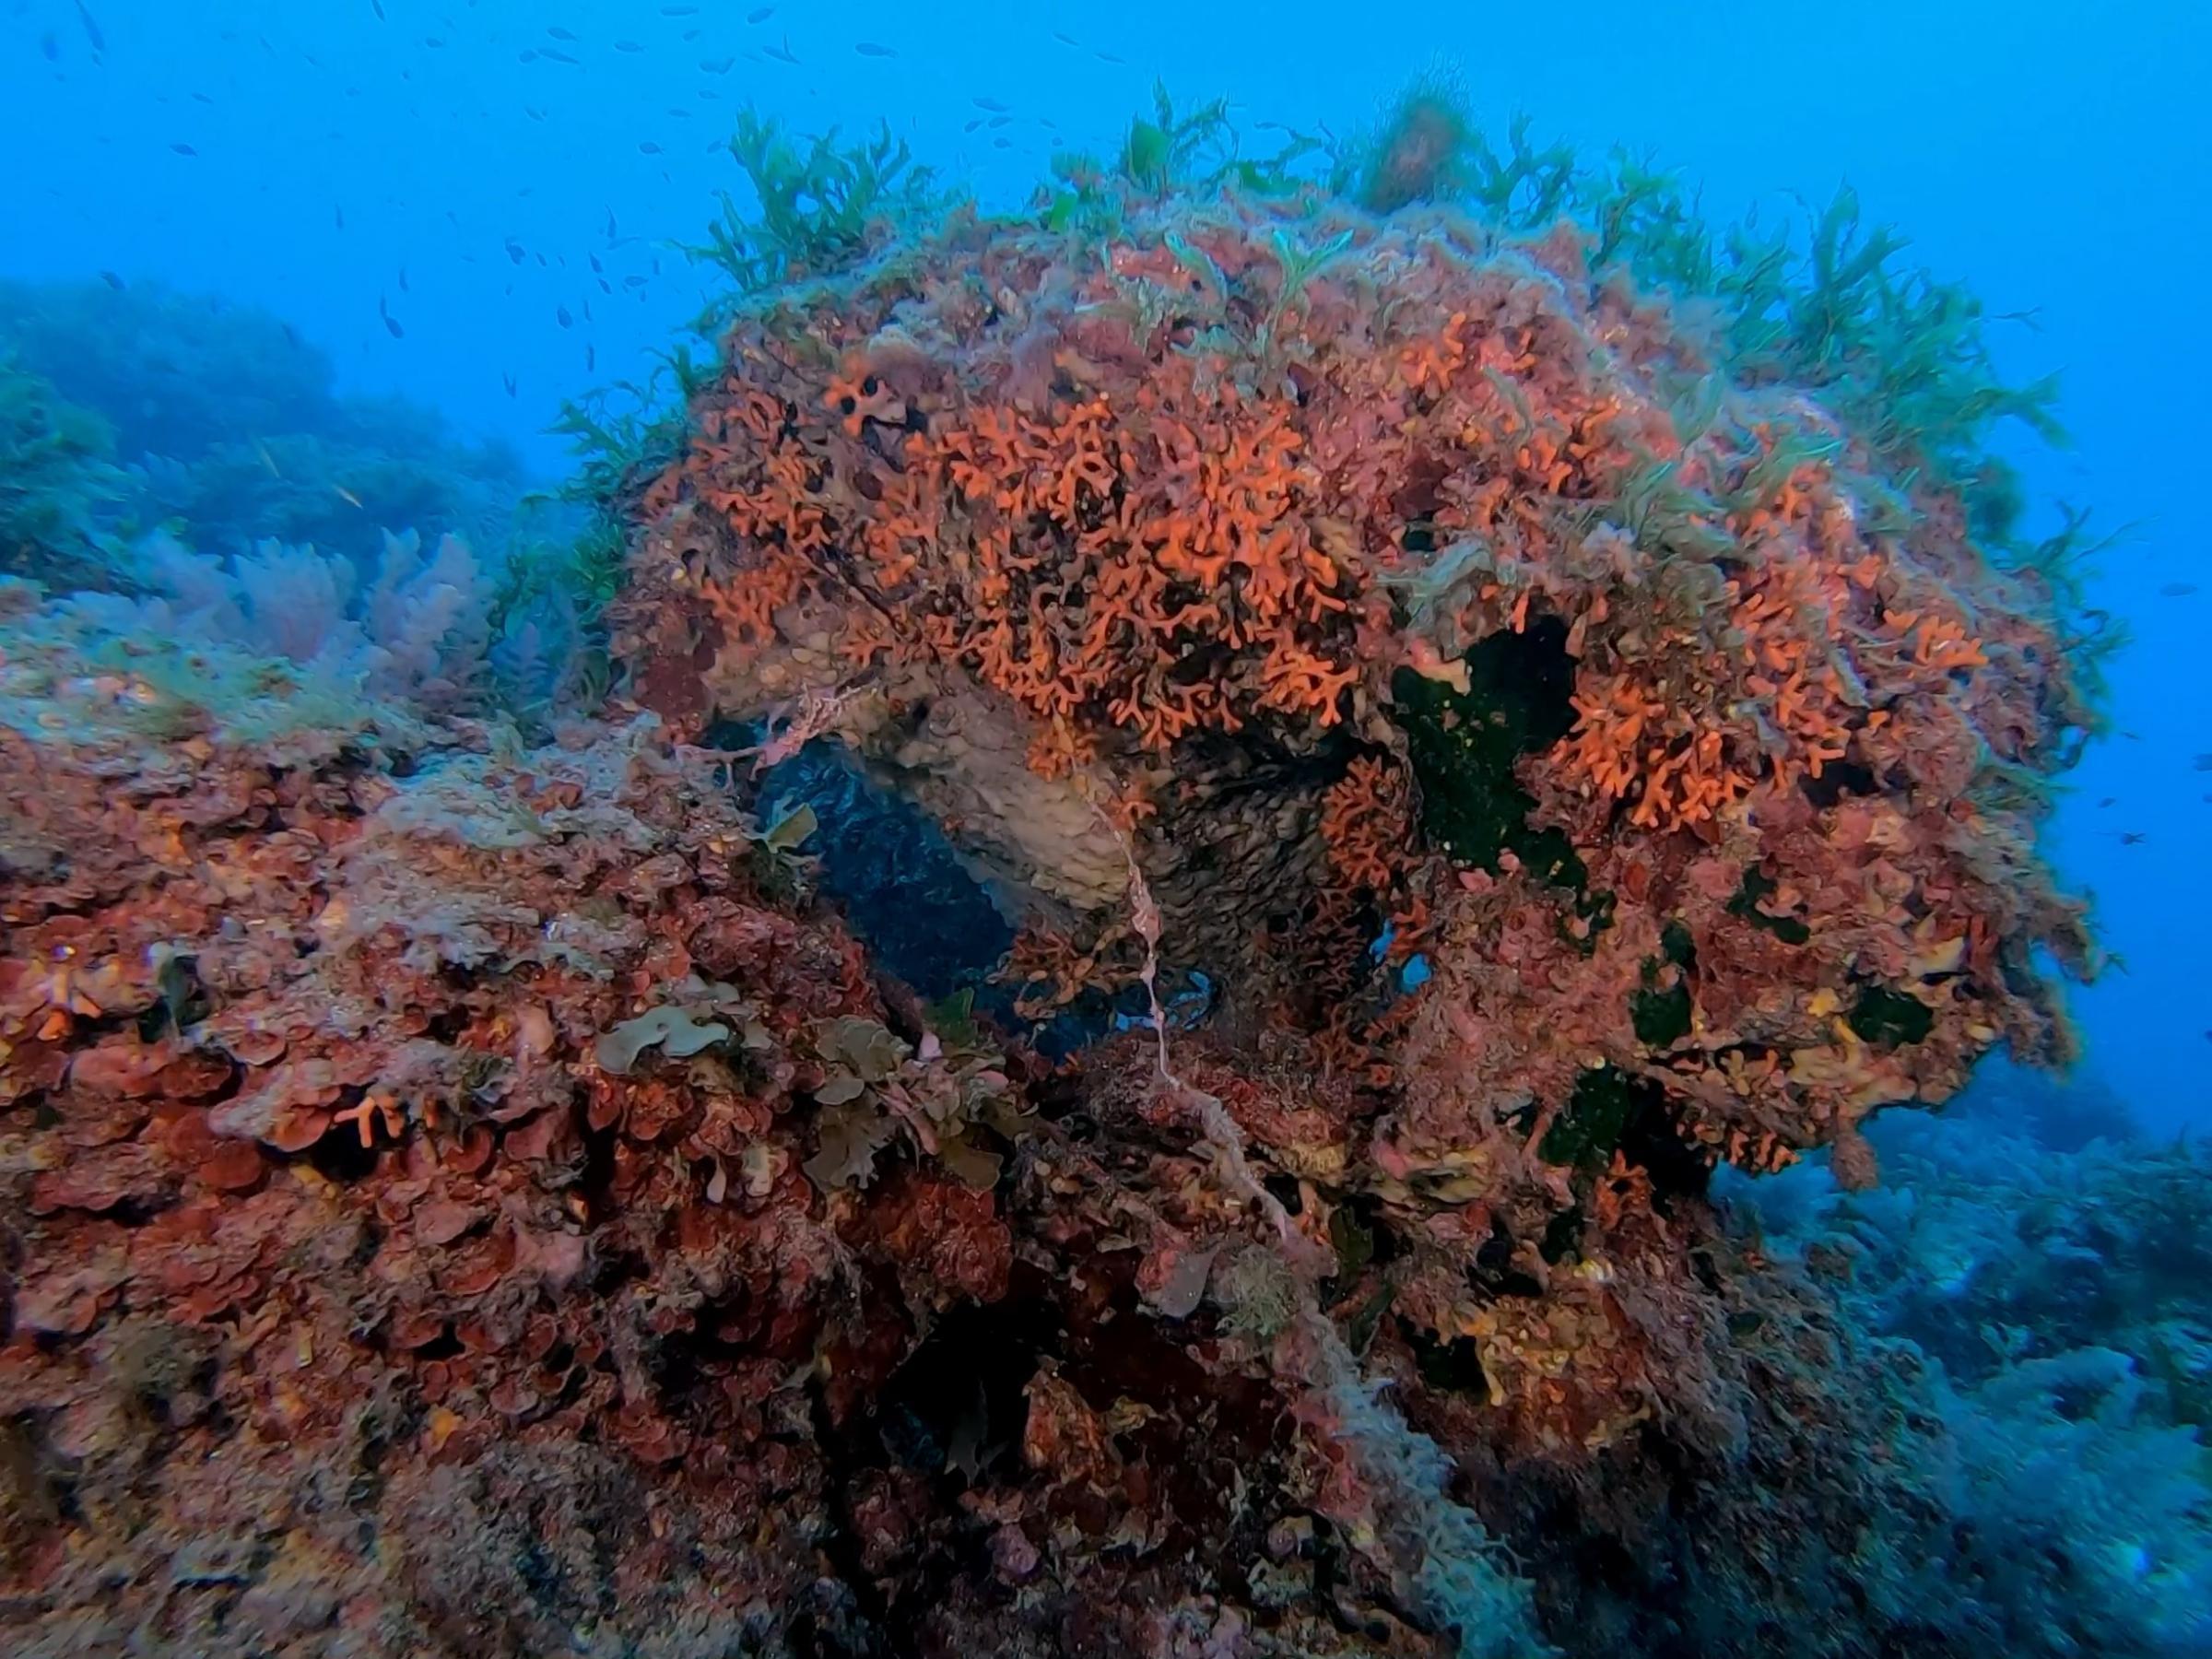 False Coral Growth [Adam Sant]